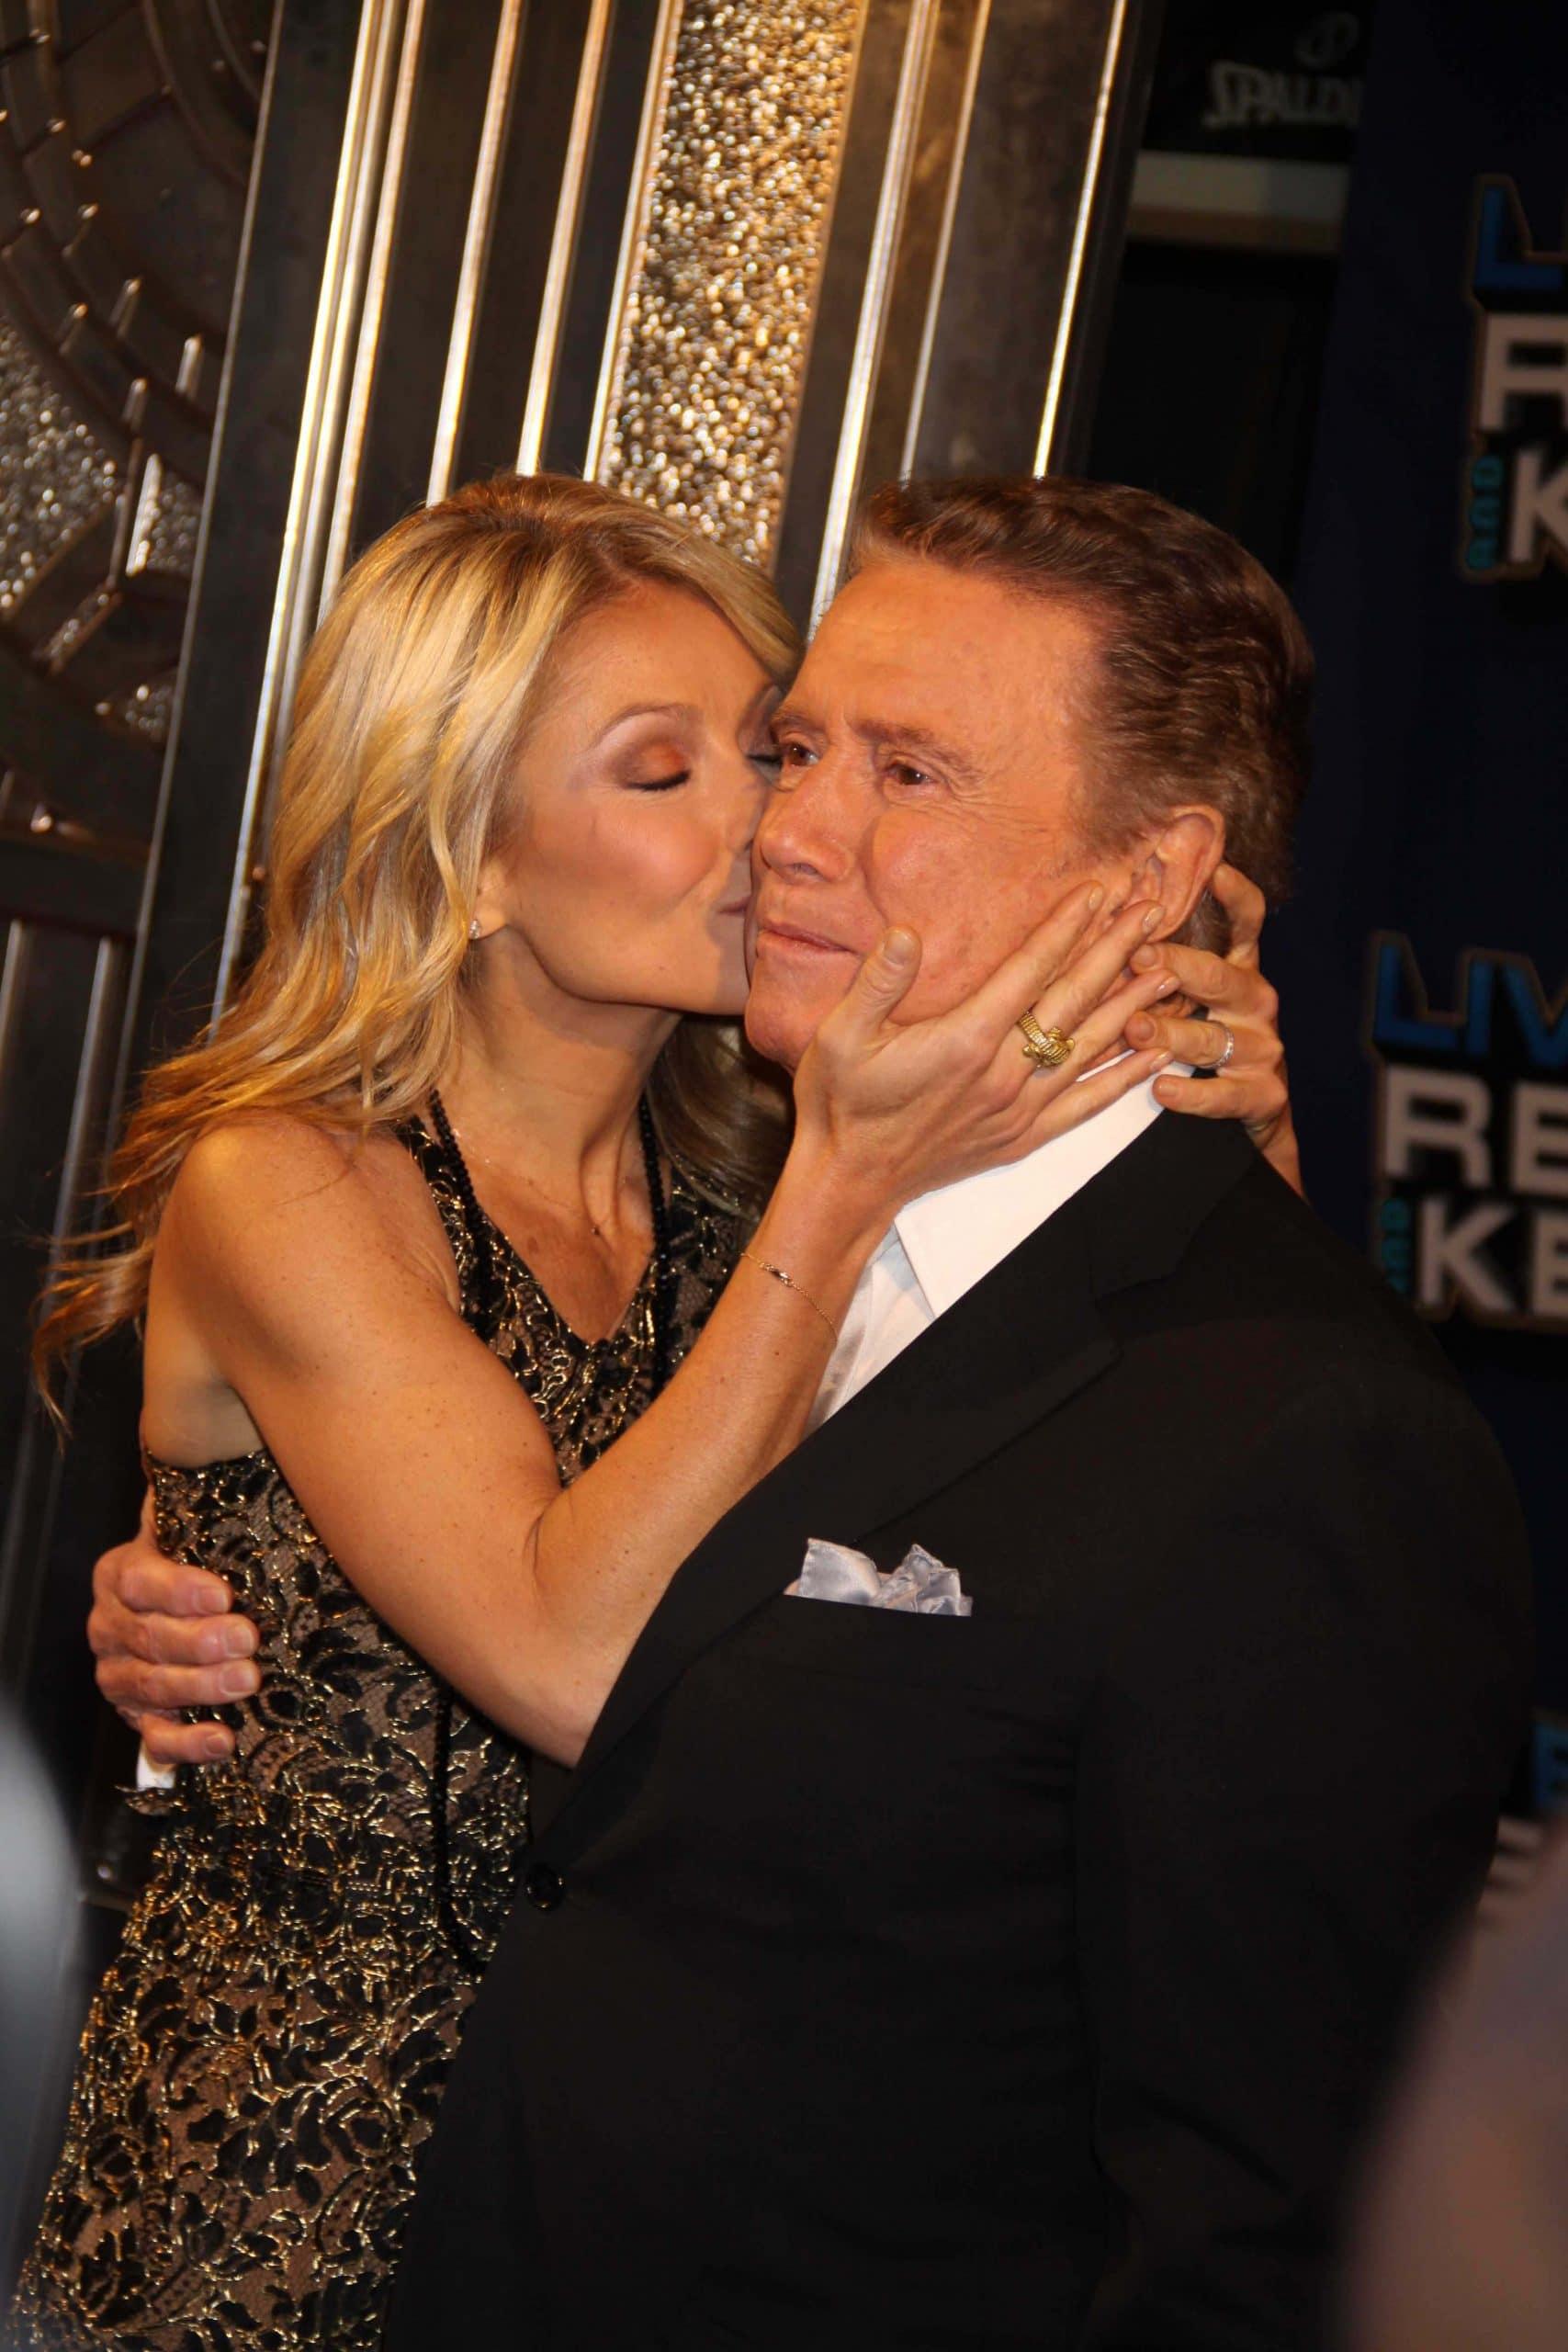 kelly ripa kissing regis philbin on the cheek at his farewell show